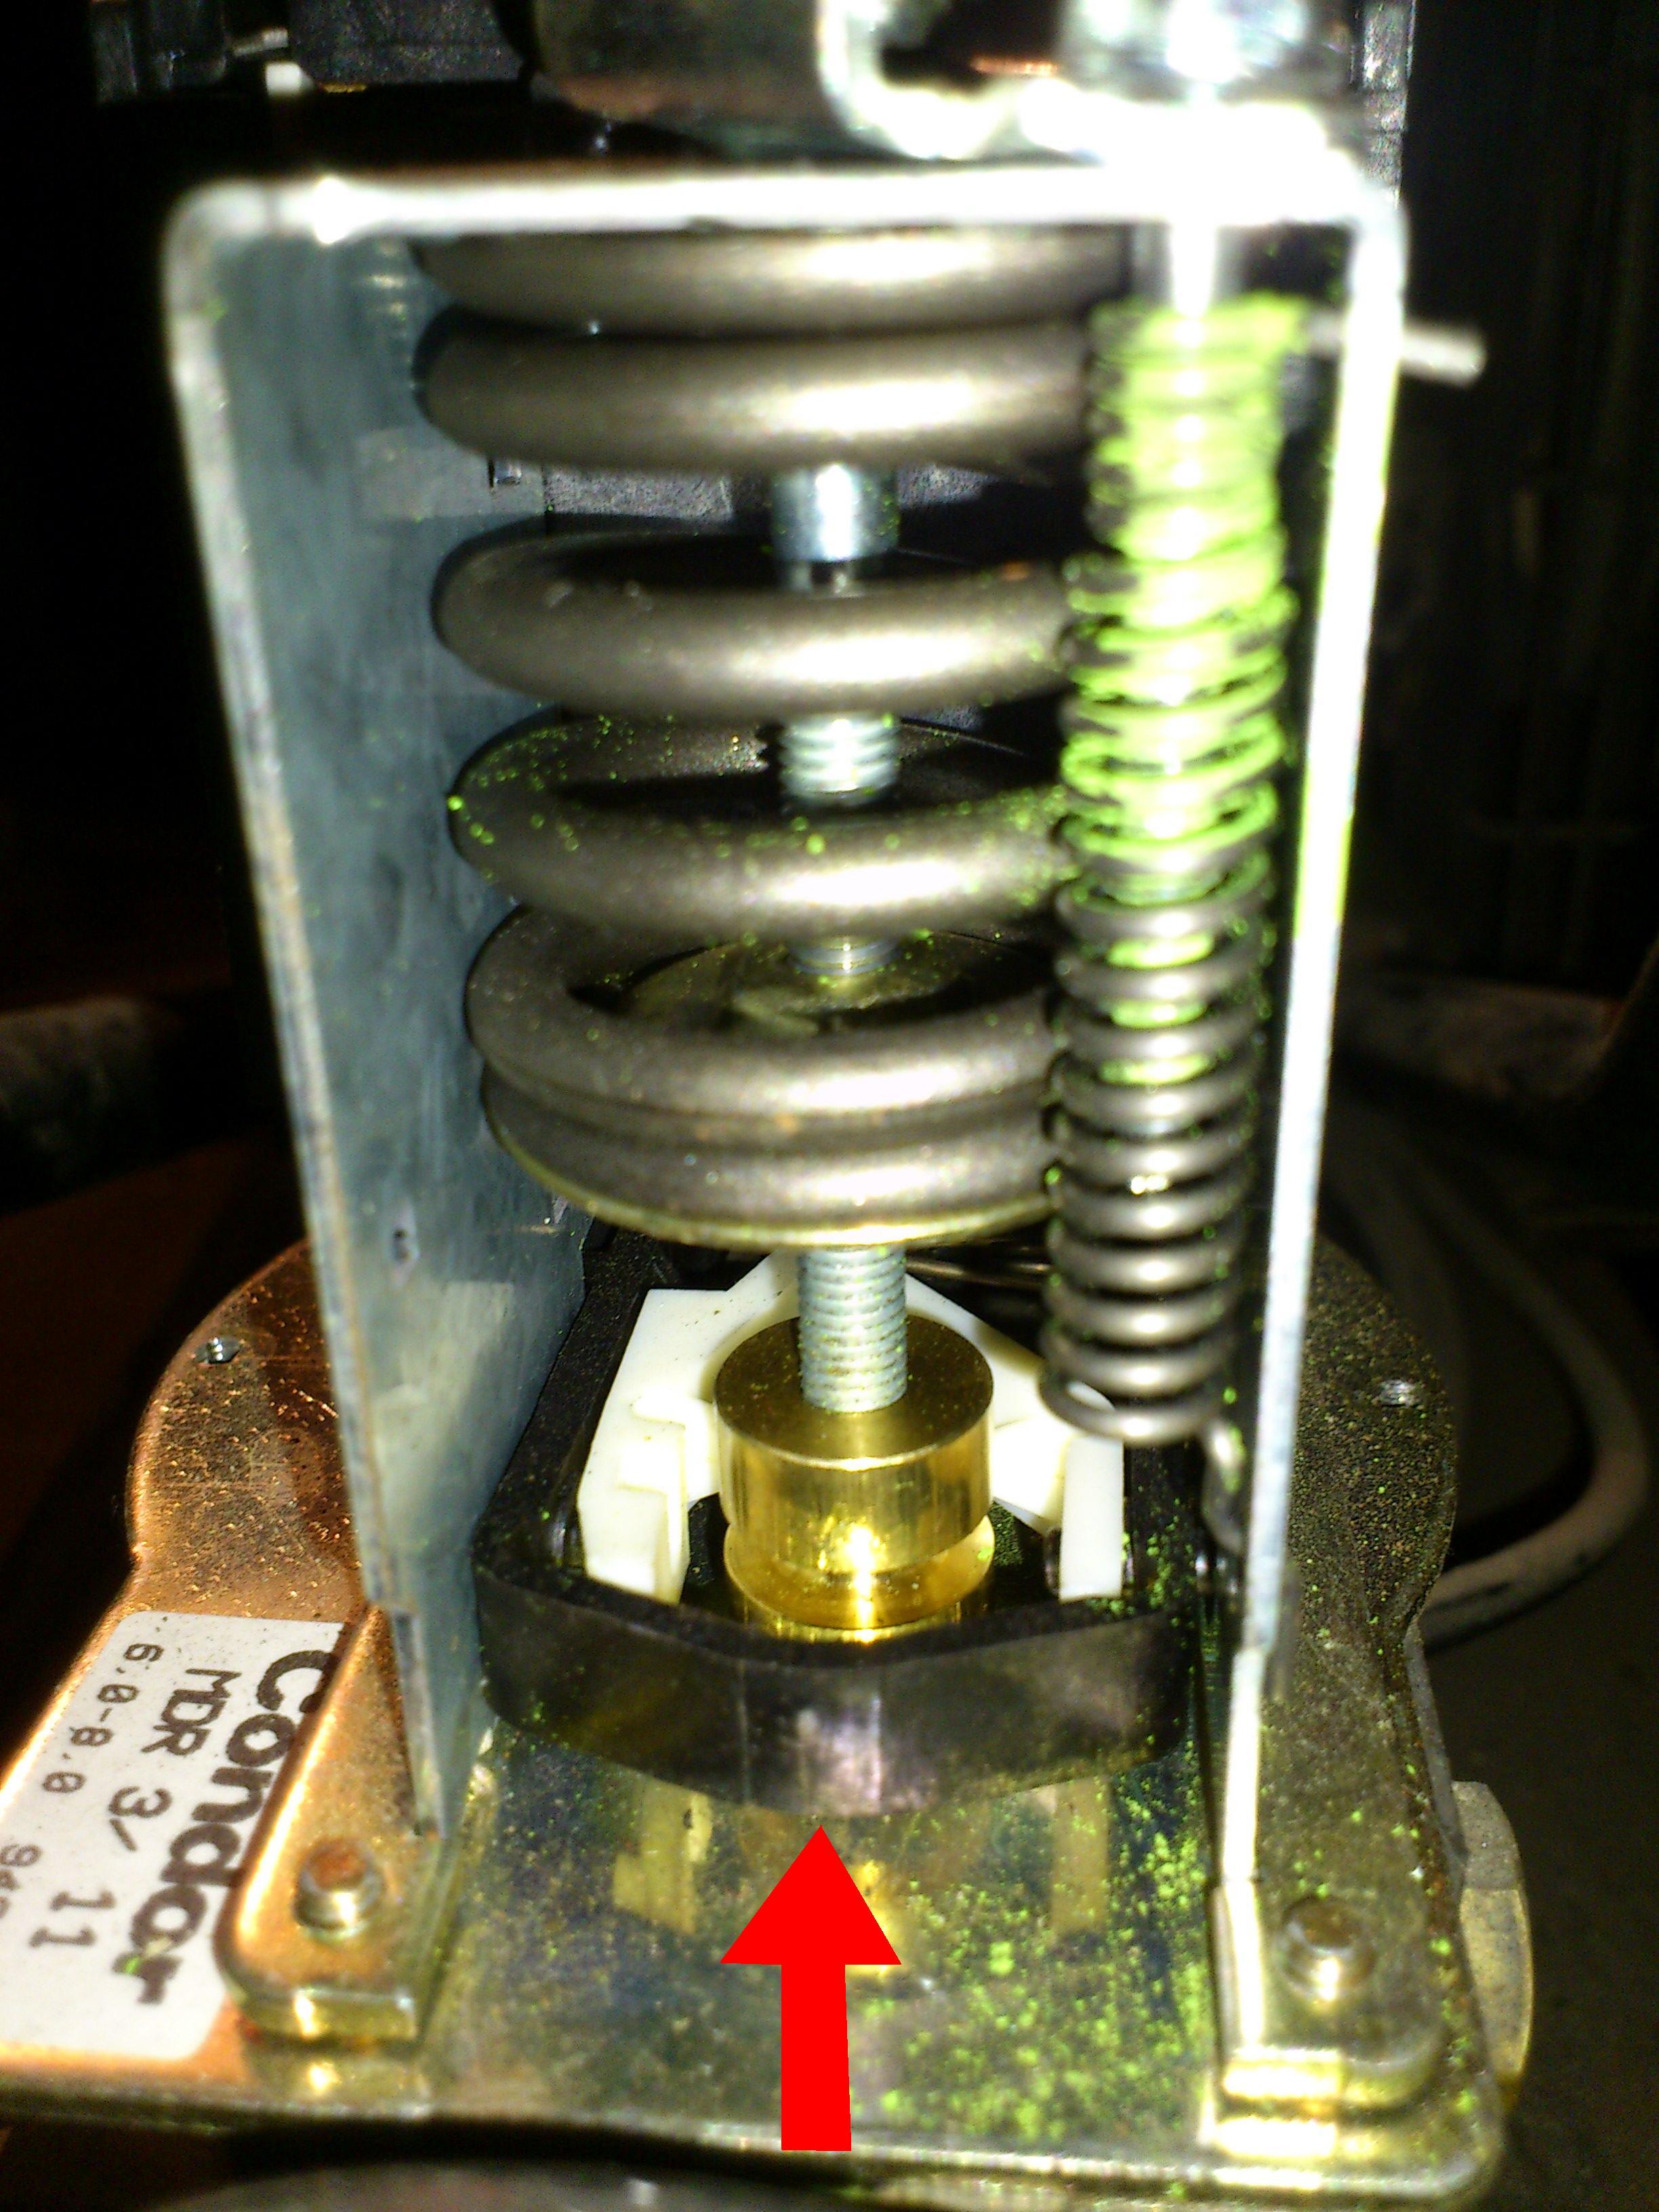 4584666200_1406195259 condor mdr 3 wiring diagram compressor pressure switch wiring condor mdr 11 wiring diagram at soozxer.org